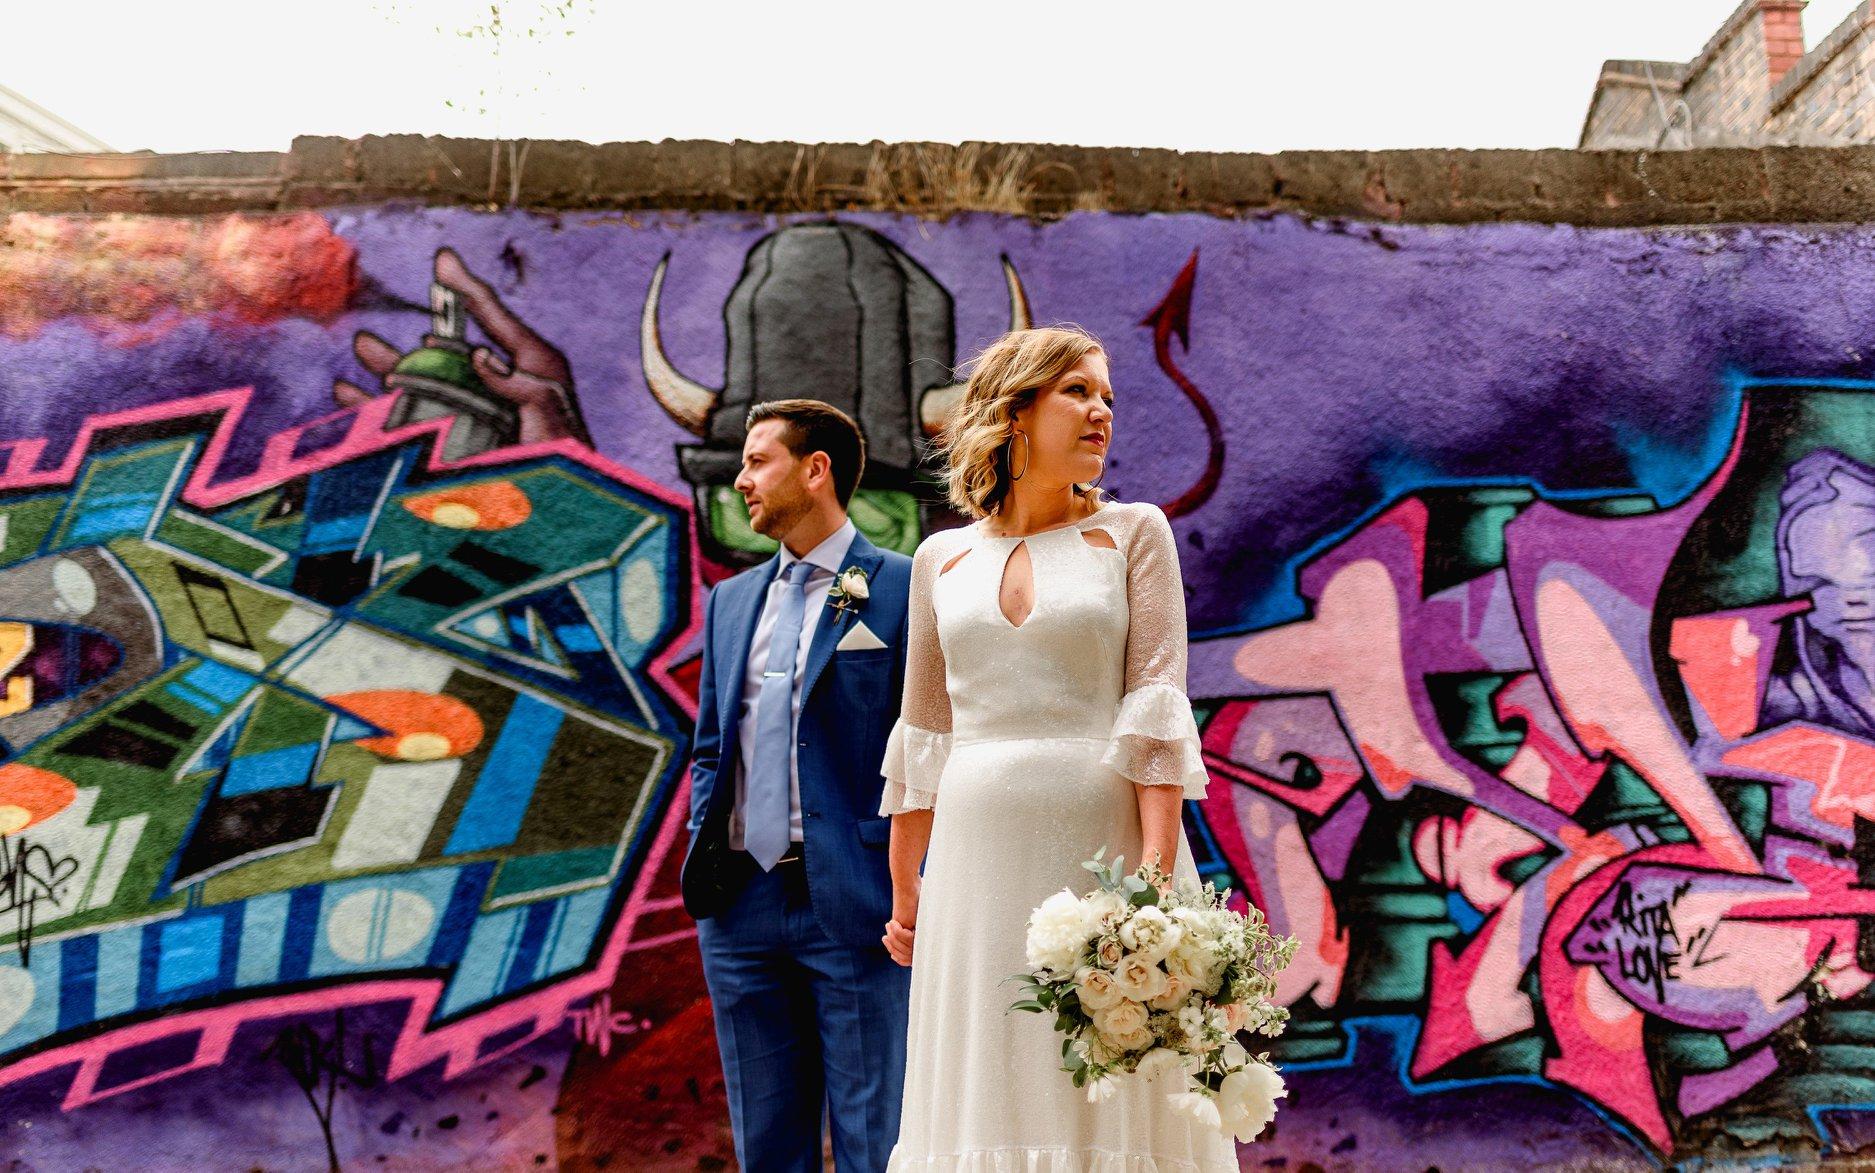 Digbeth Weddings- Lisa Carpenter Photos Birmingham Wedding Venues- Unique Birmingham Wedding Venue- The Best Alternative Wedding Venues- Unconventional Wedding